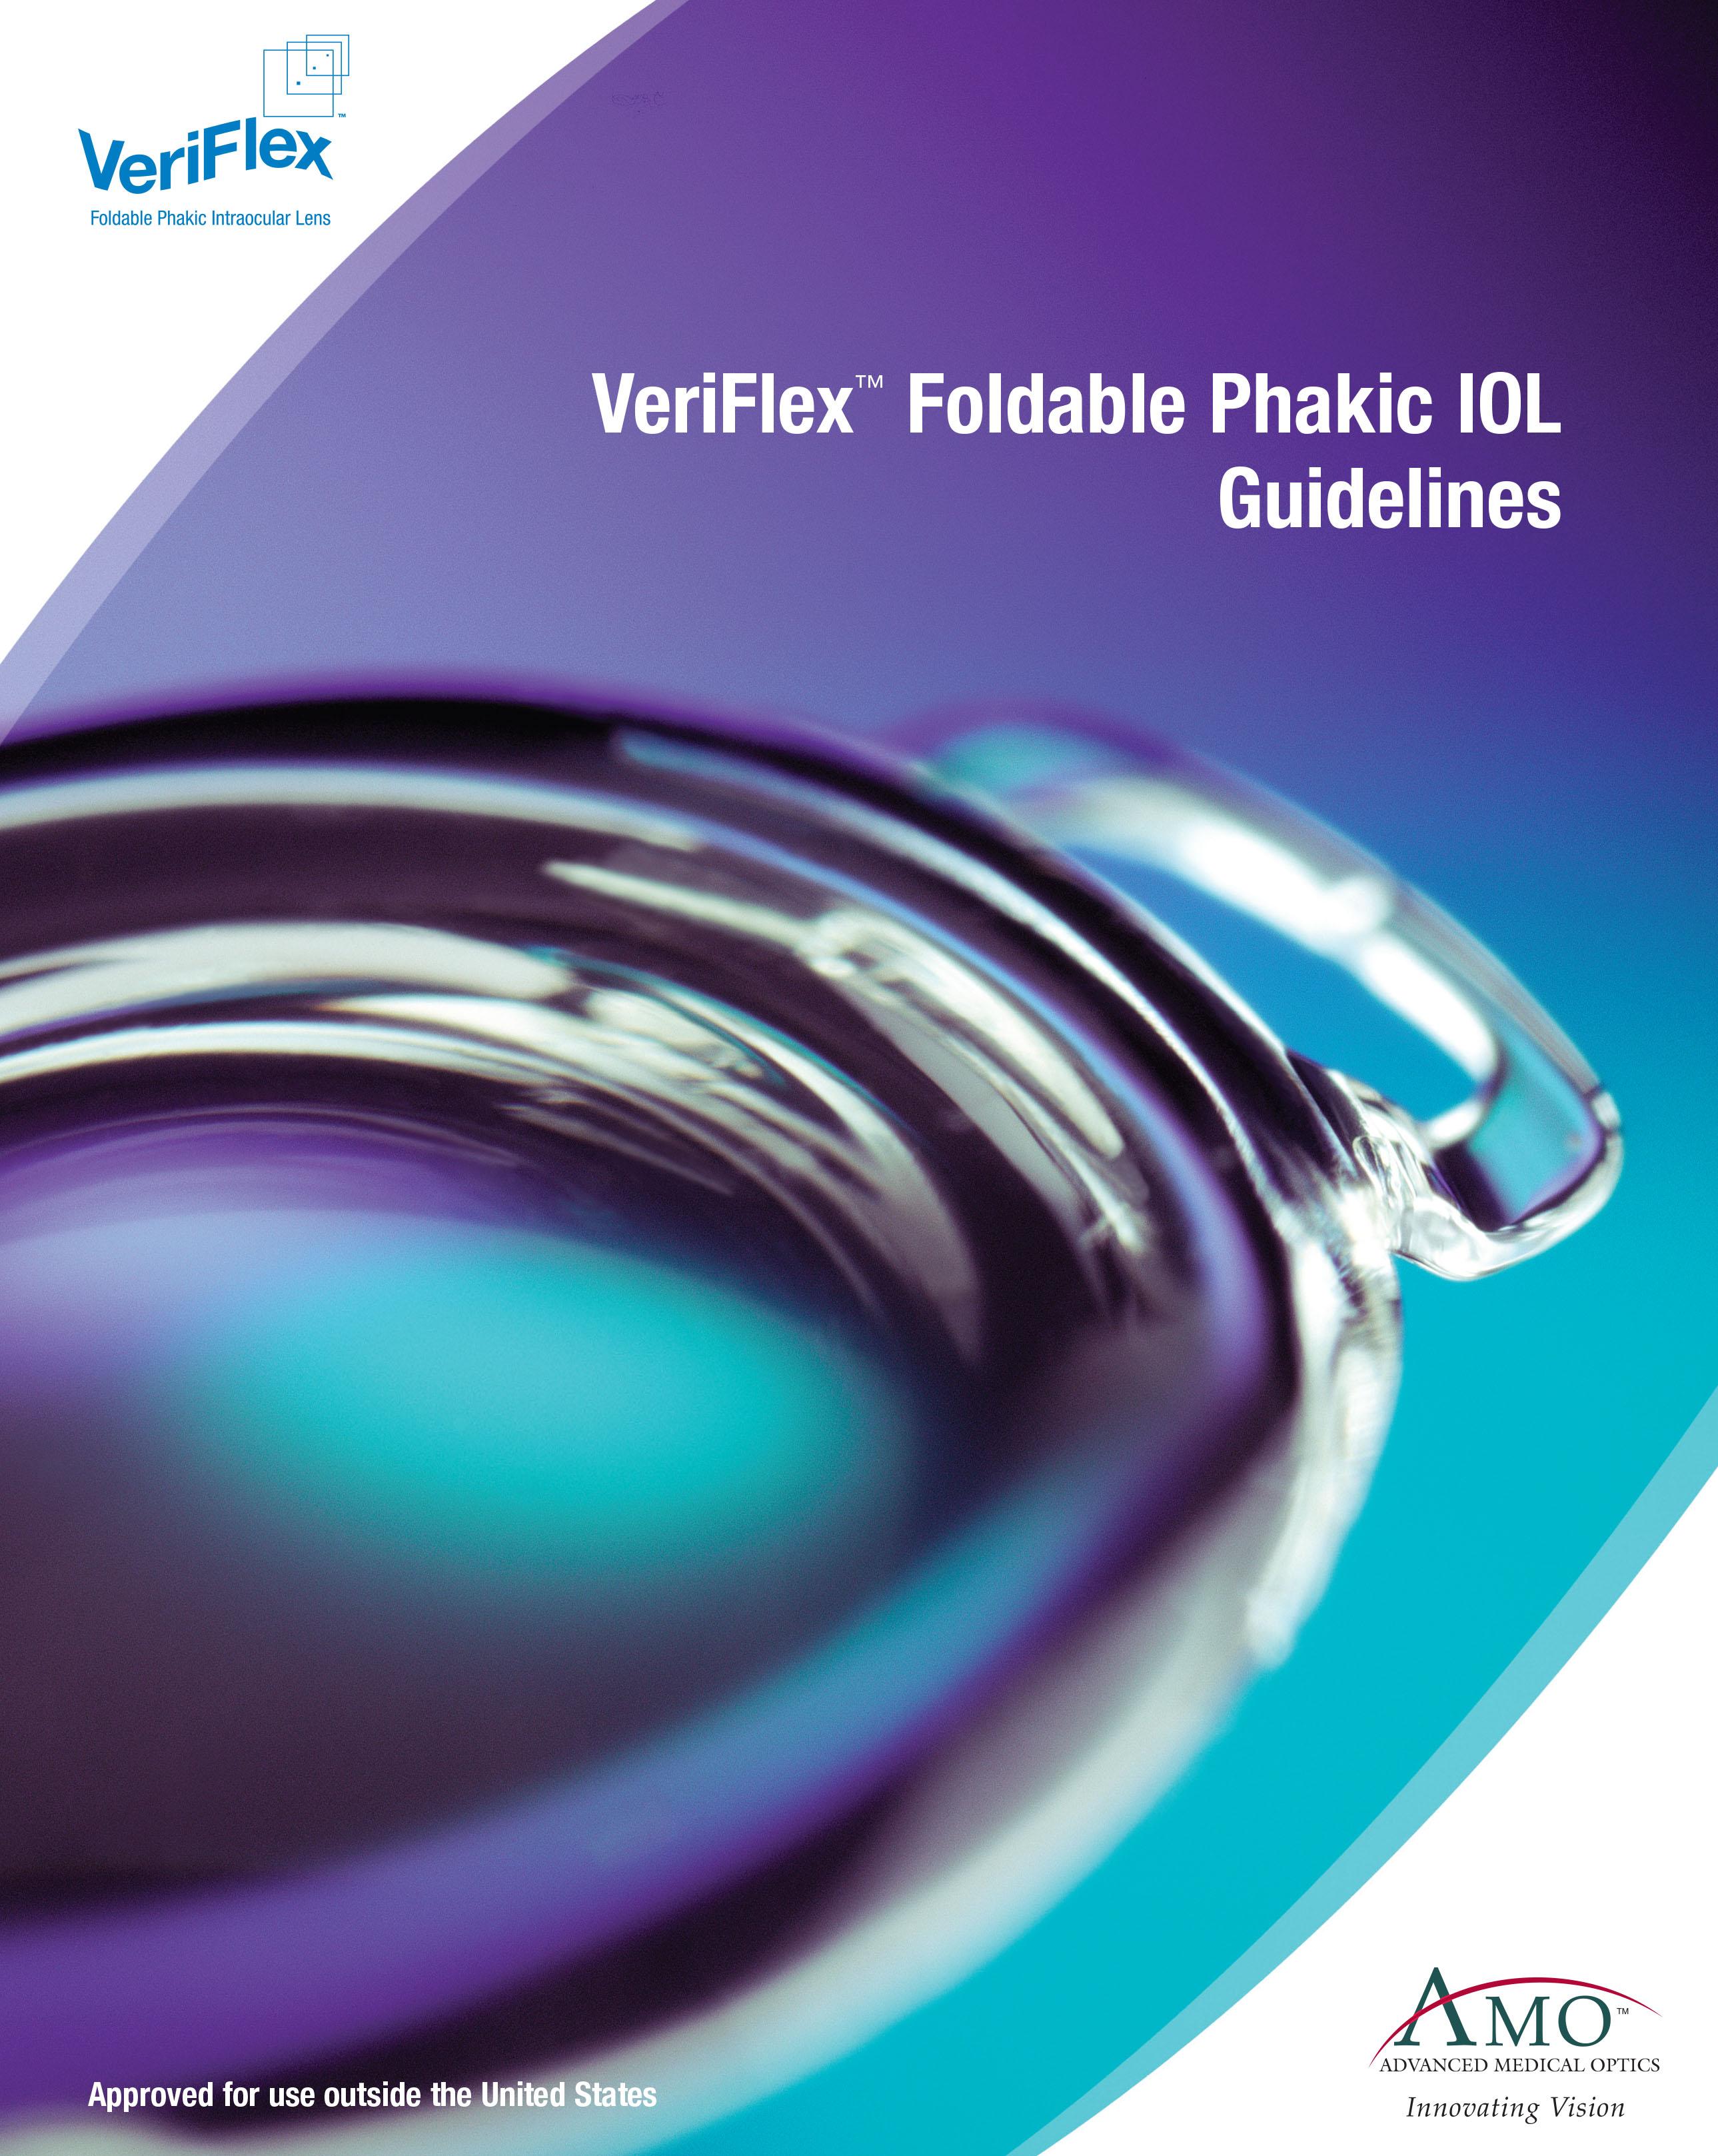 Veriflex DFU